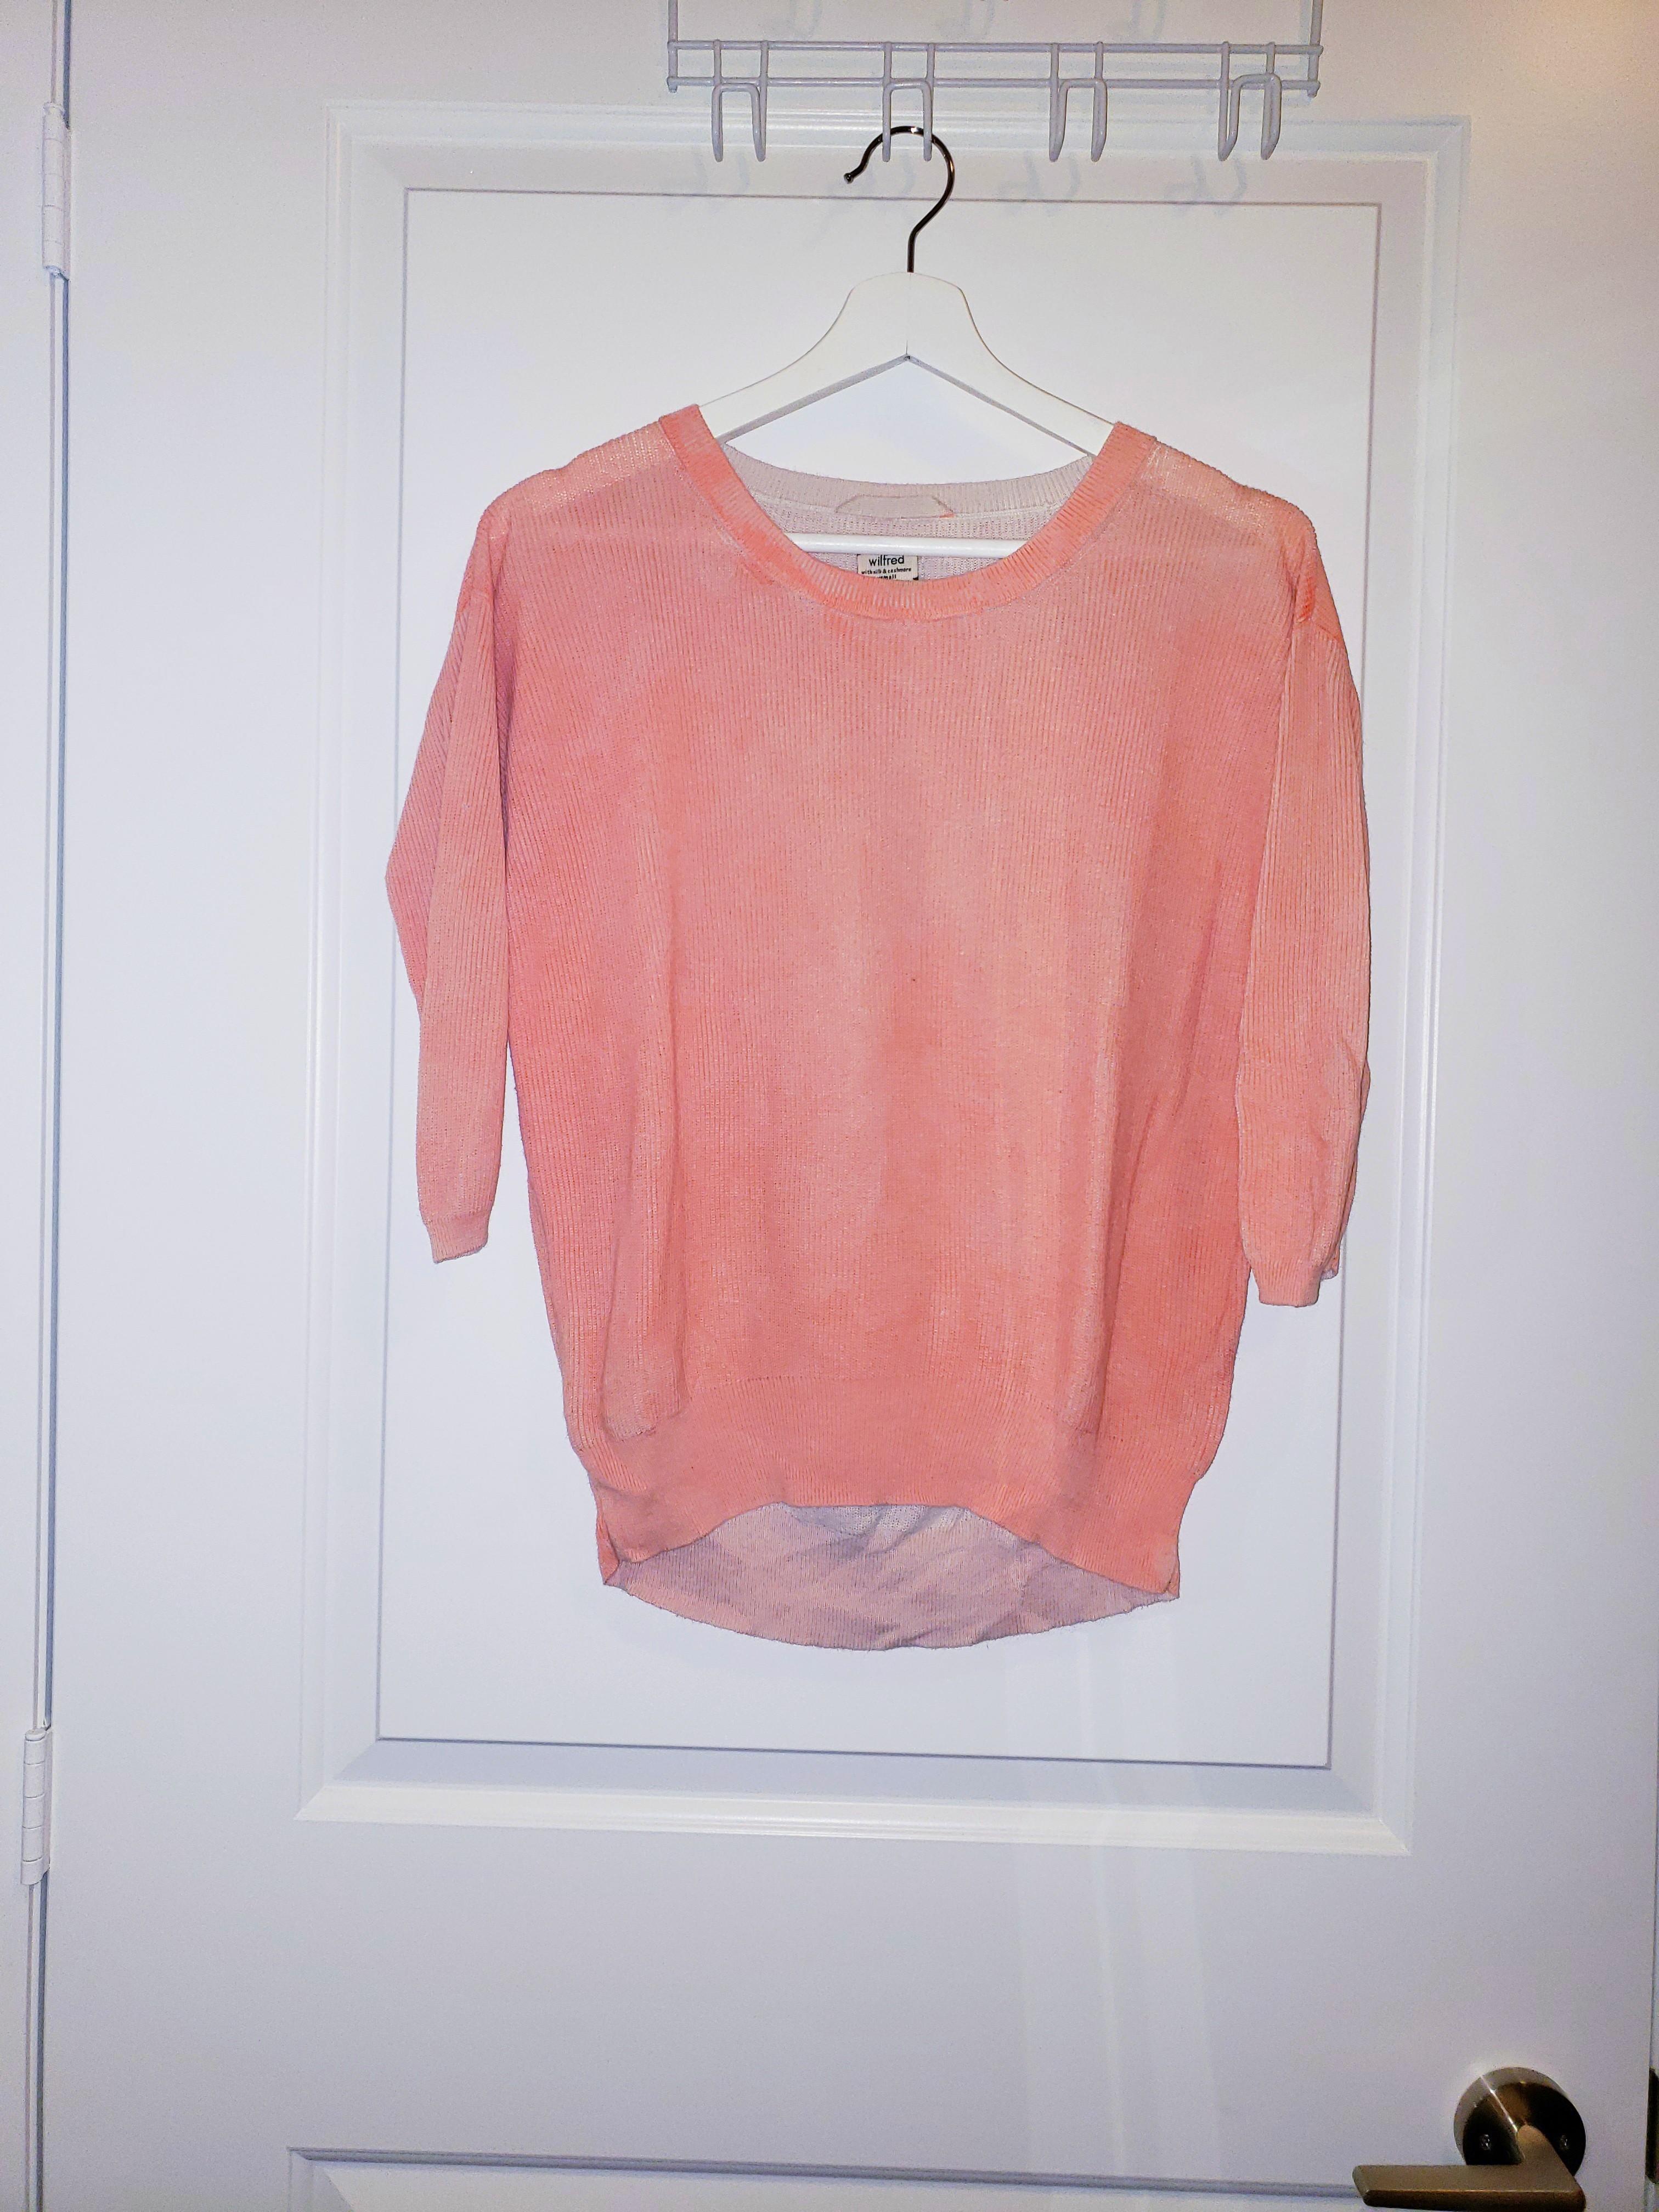 Wilfred Peach Silk Top - Size S